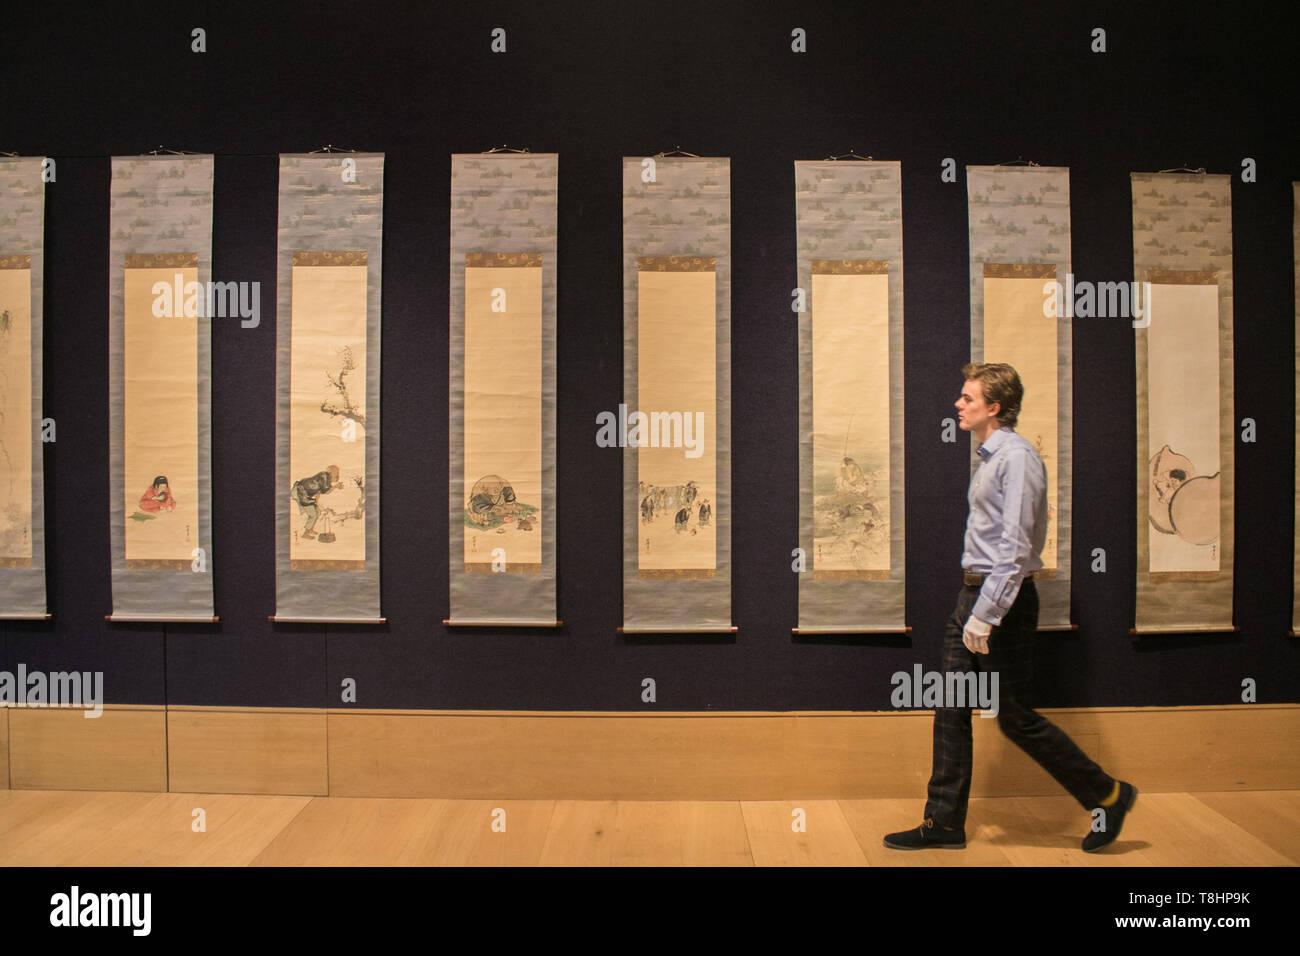 London UK. 13th May 2019. Suzuki Shonen (1849-1918). Meiji or Taisho era, early 20th century set of 12 kakejiku (vertical hanging scrolls) carries an estimate of £5,000-8,000 at Bonhams Fine Japanese Art sale.Photo call for  Fine Chinese and Fine Japanese sales at Bonhams  New Bond street Credit: amer ghazzal/Alamy Live News - Stock Image